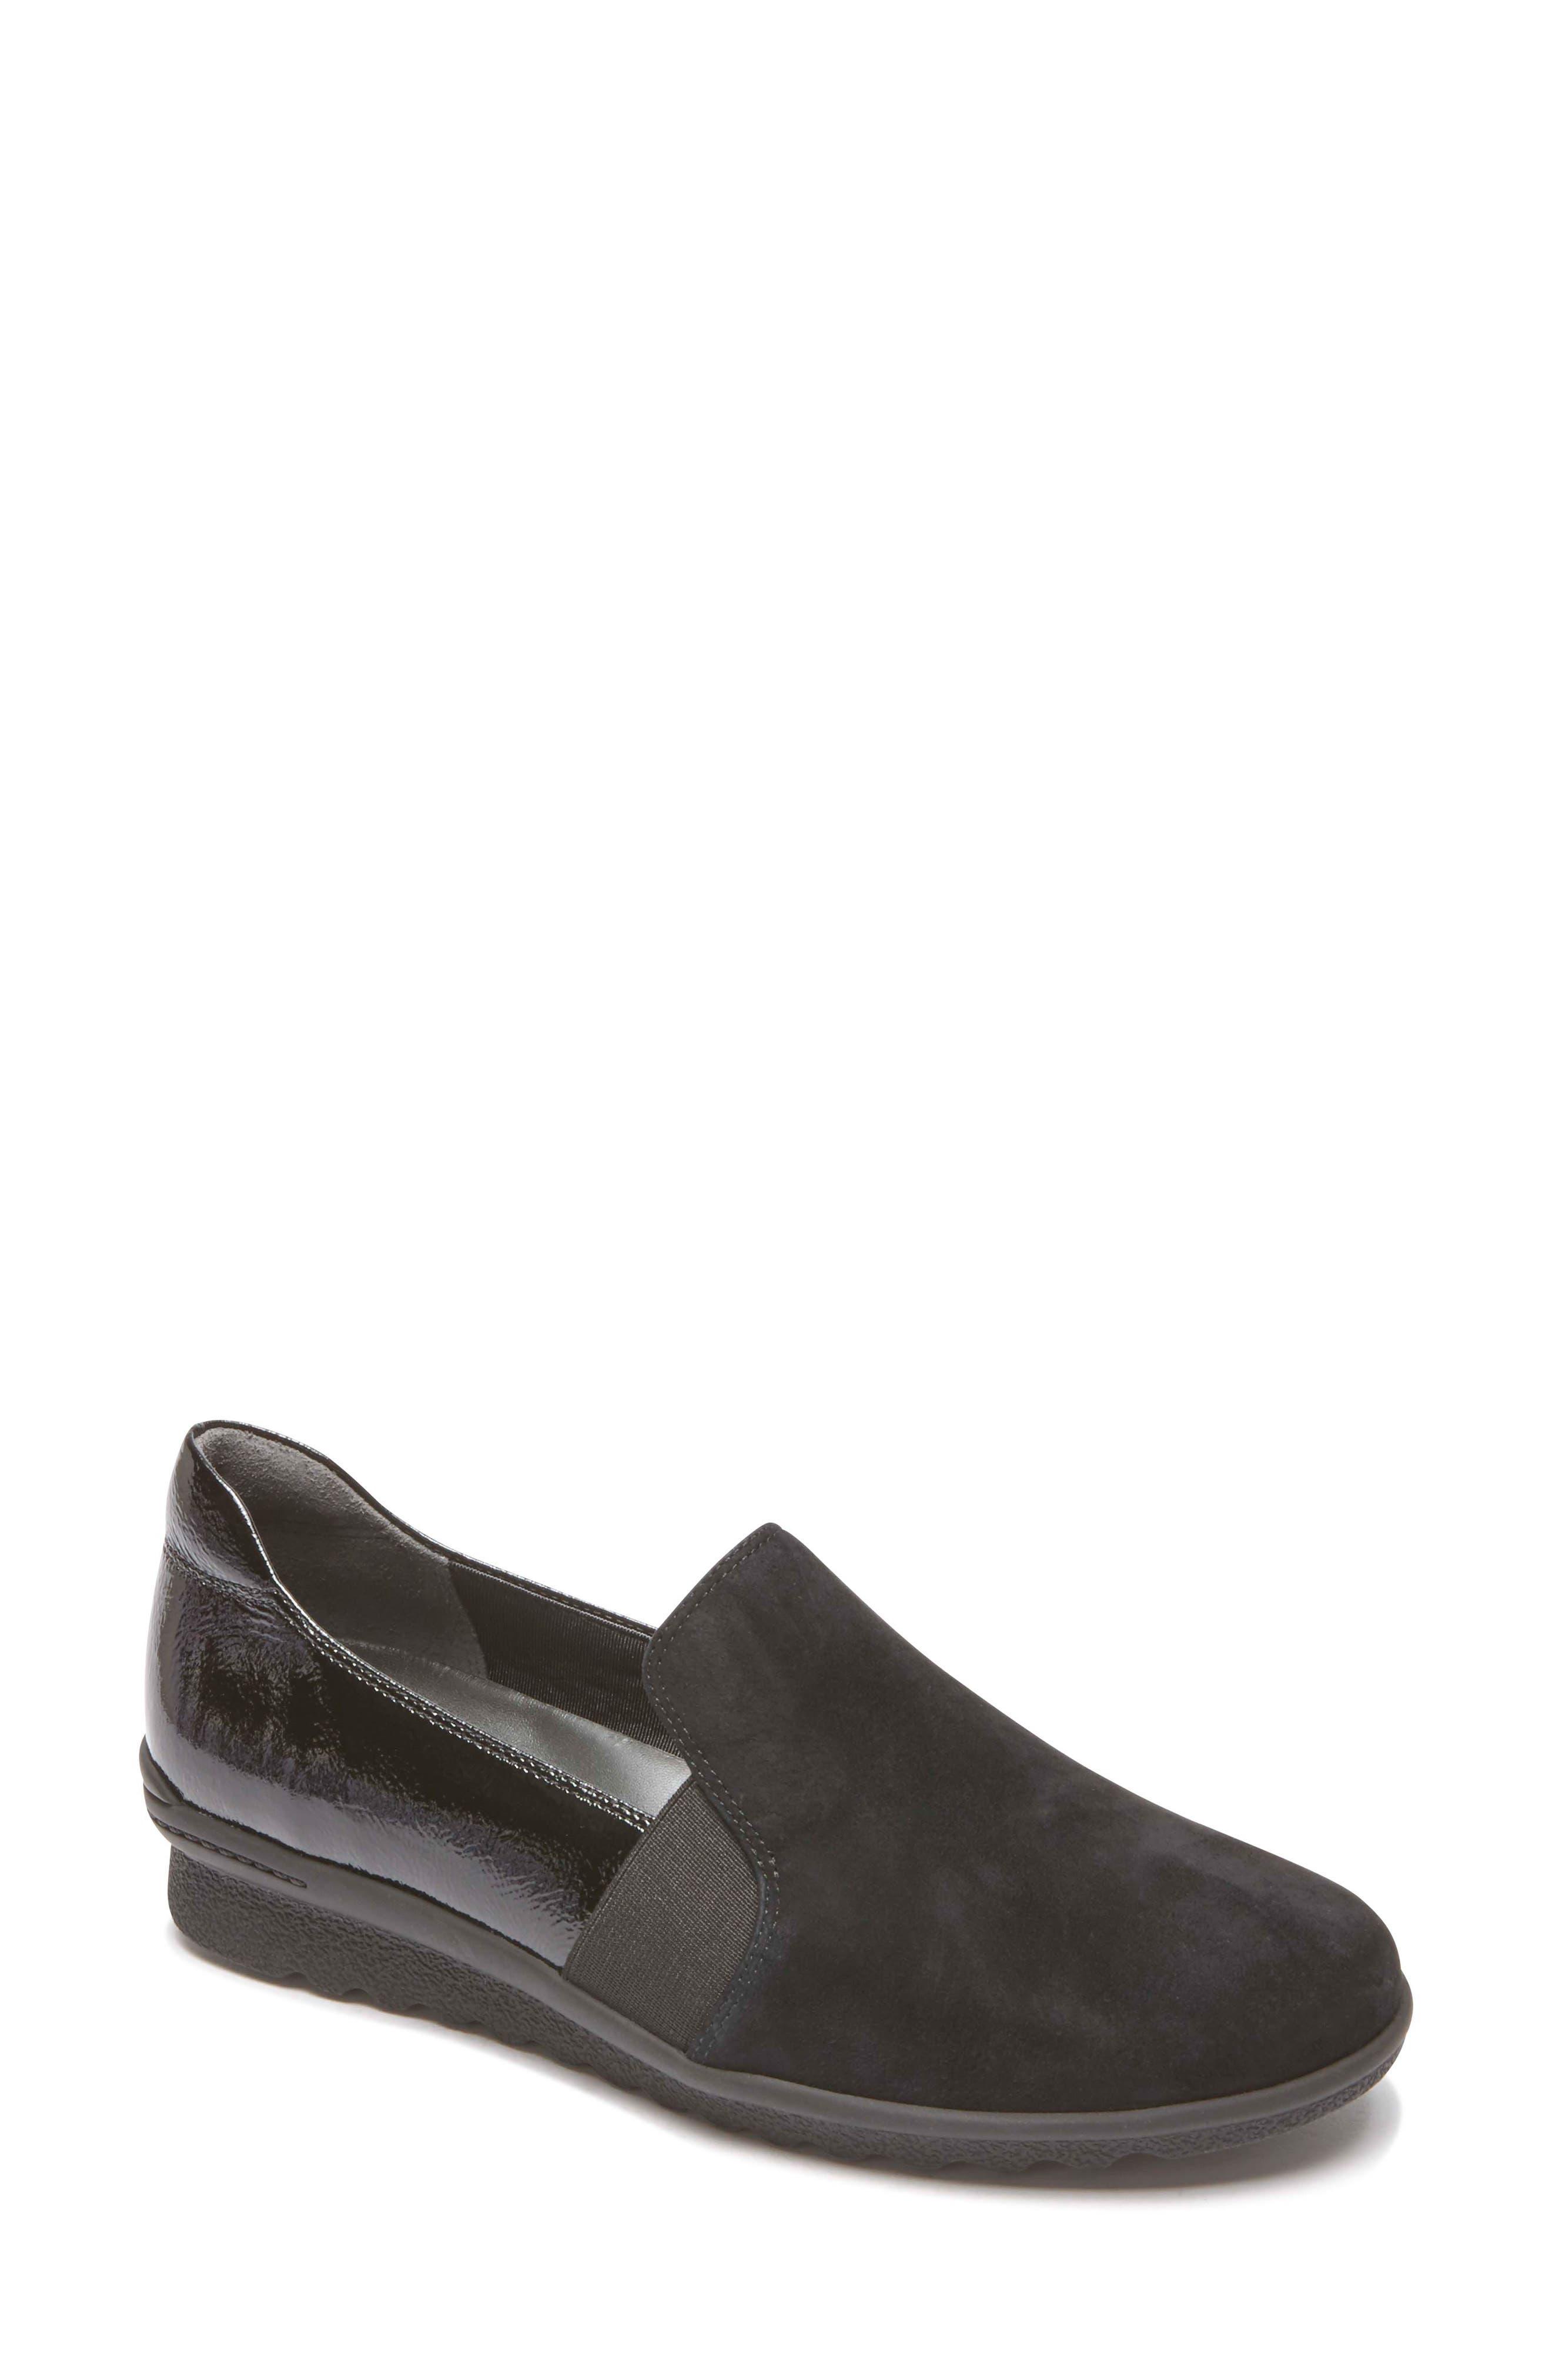 Chenole Loafer,                         Main,                         color, BLACK SUEDE